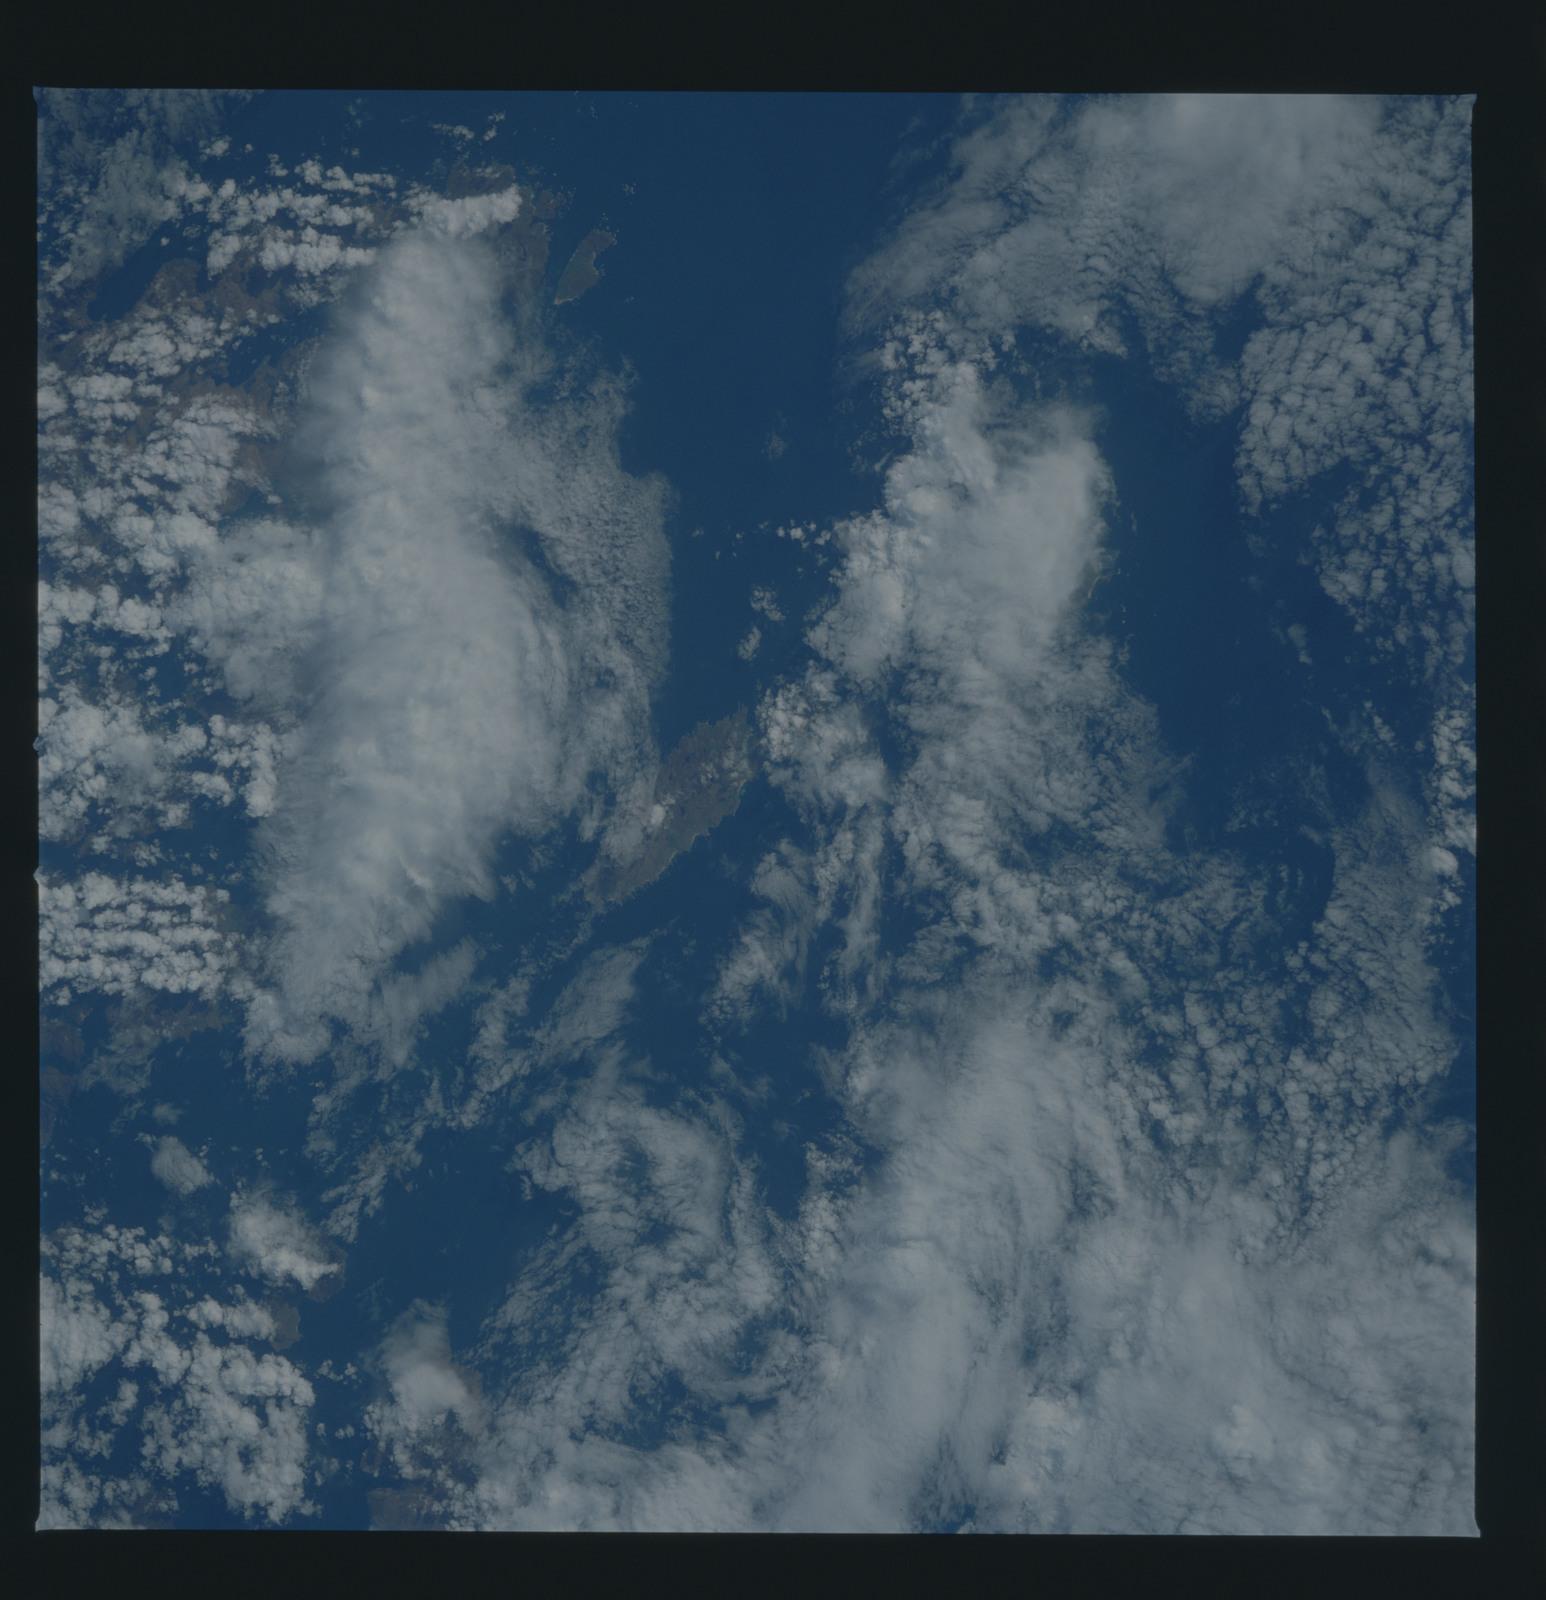 51B-34-060 - STS-51B - 51B earth observation